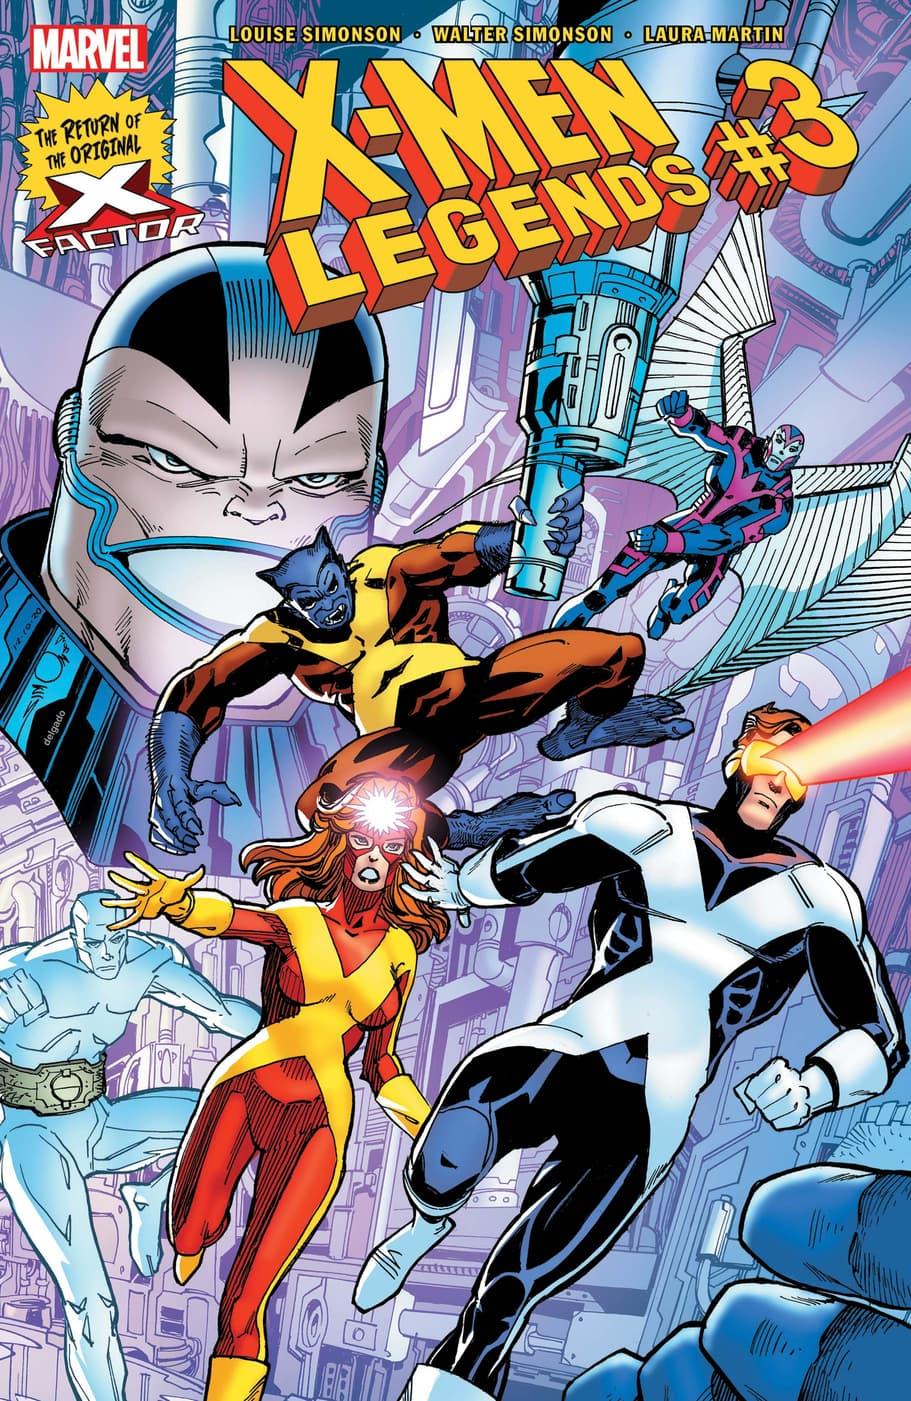 X-MEN LEGENDS #3 cover by Walter Simonson